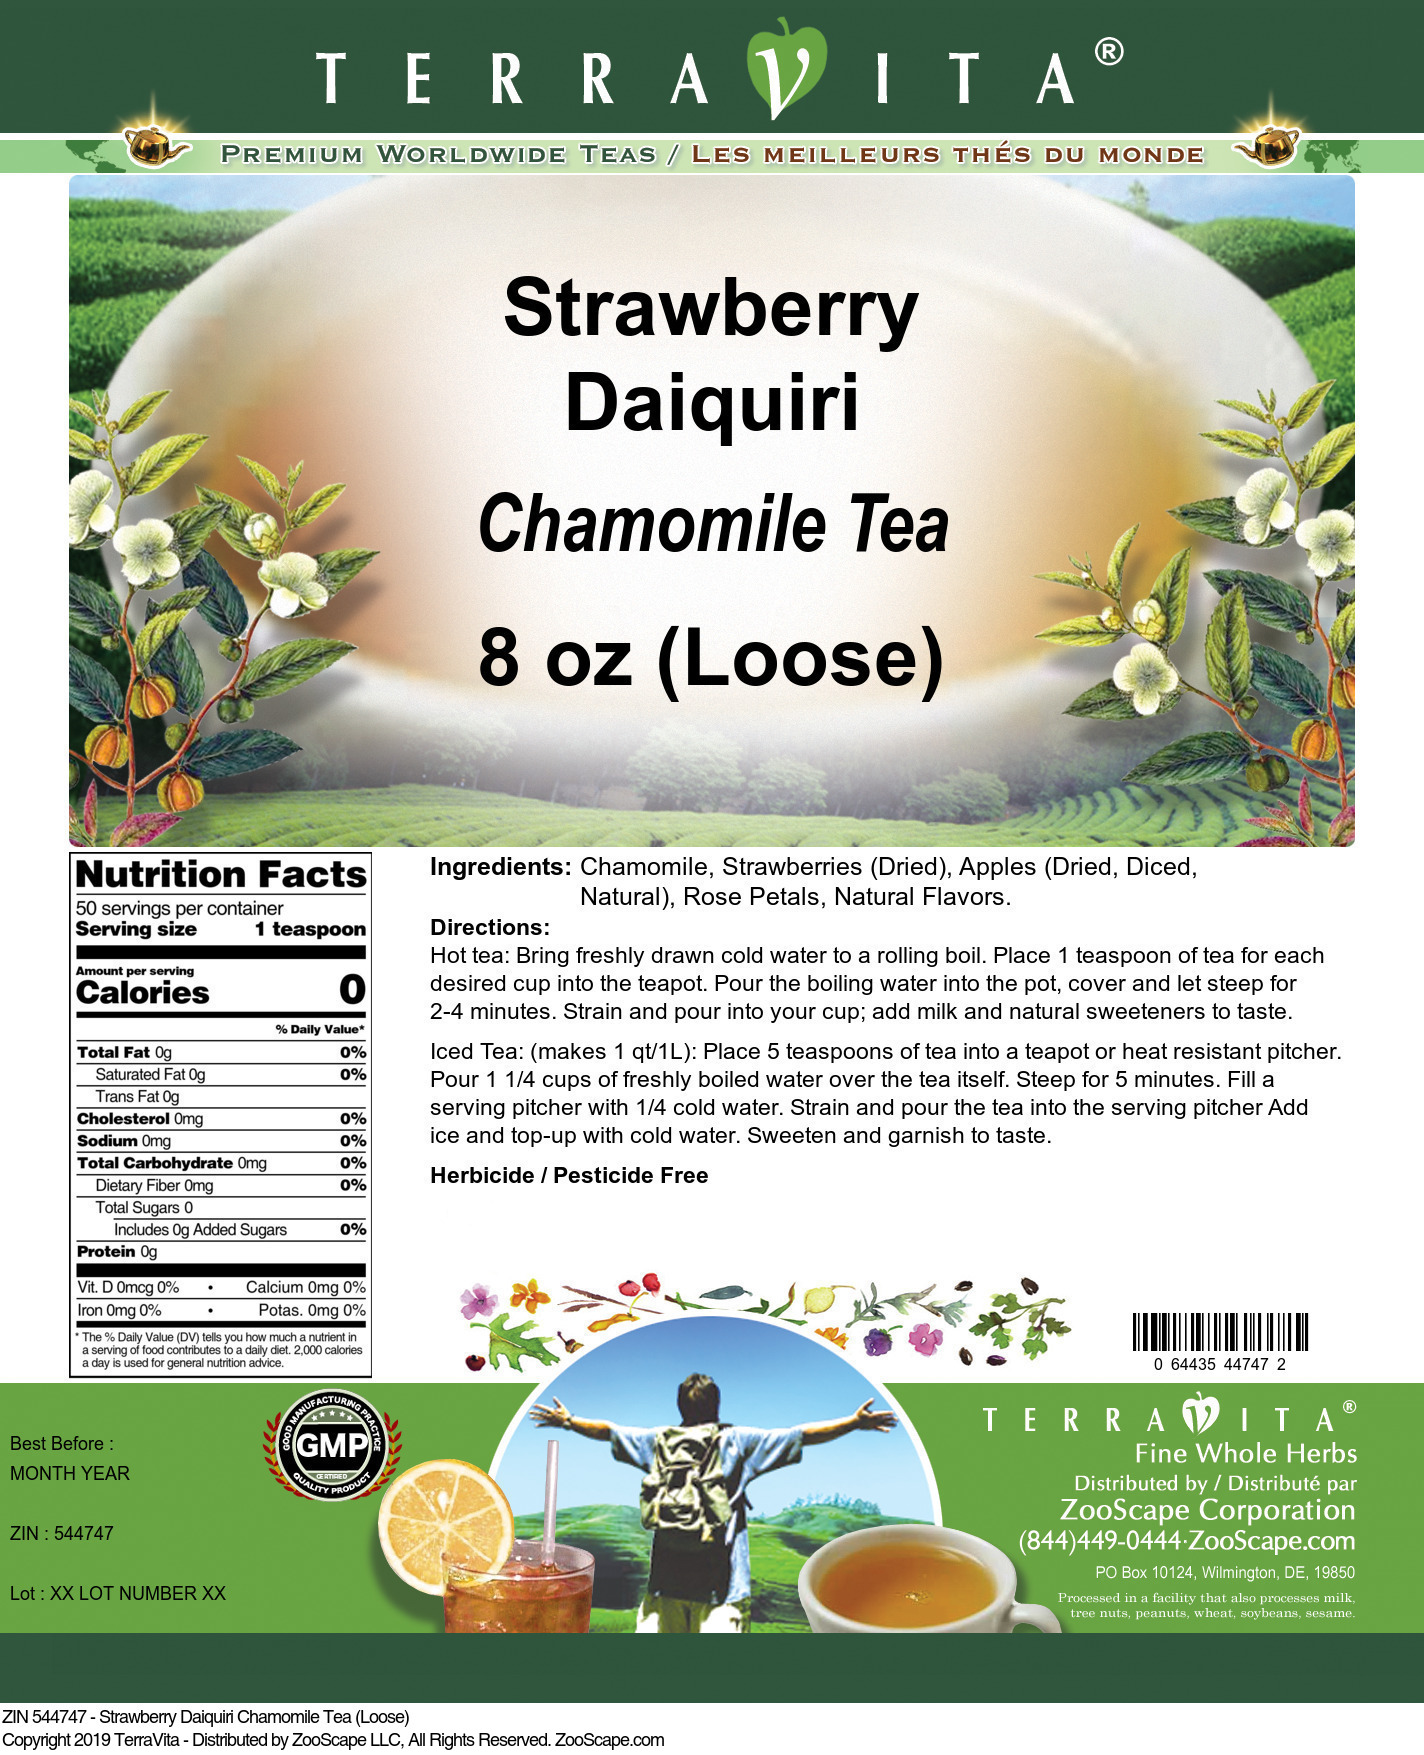 Strawberry Daiquiri Chamomile Tea